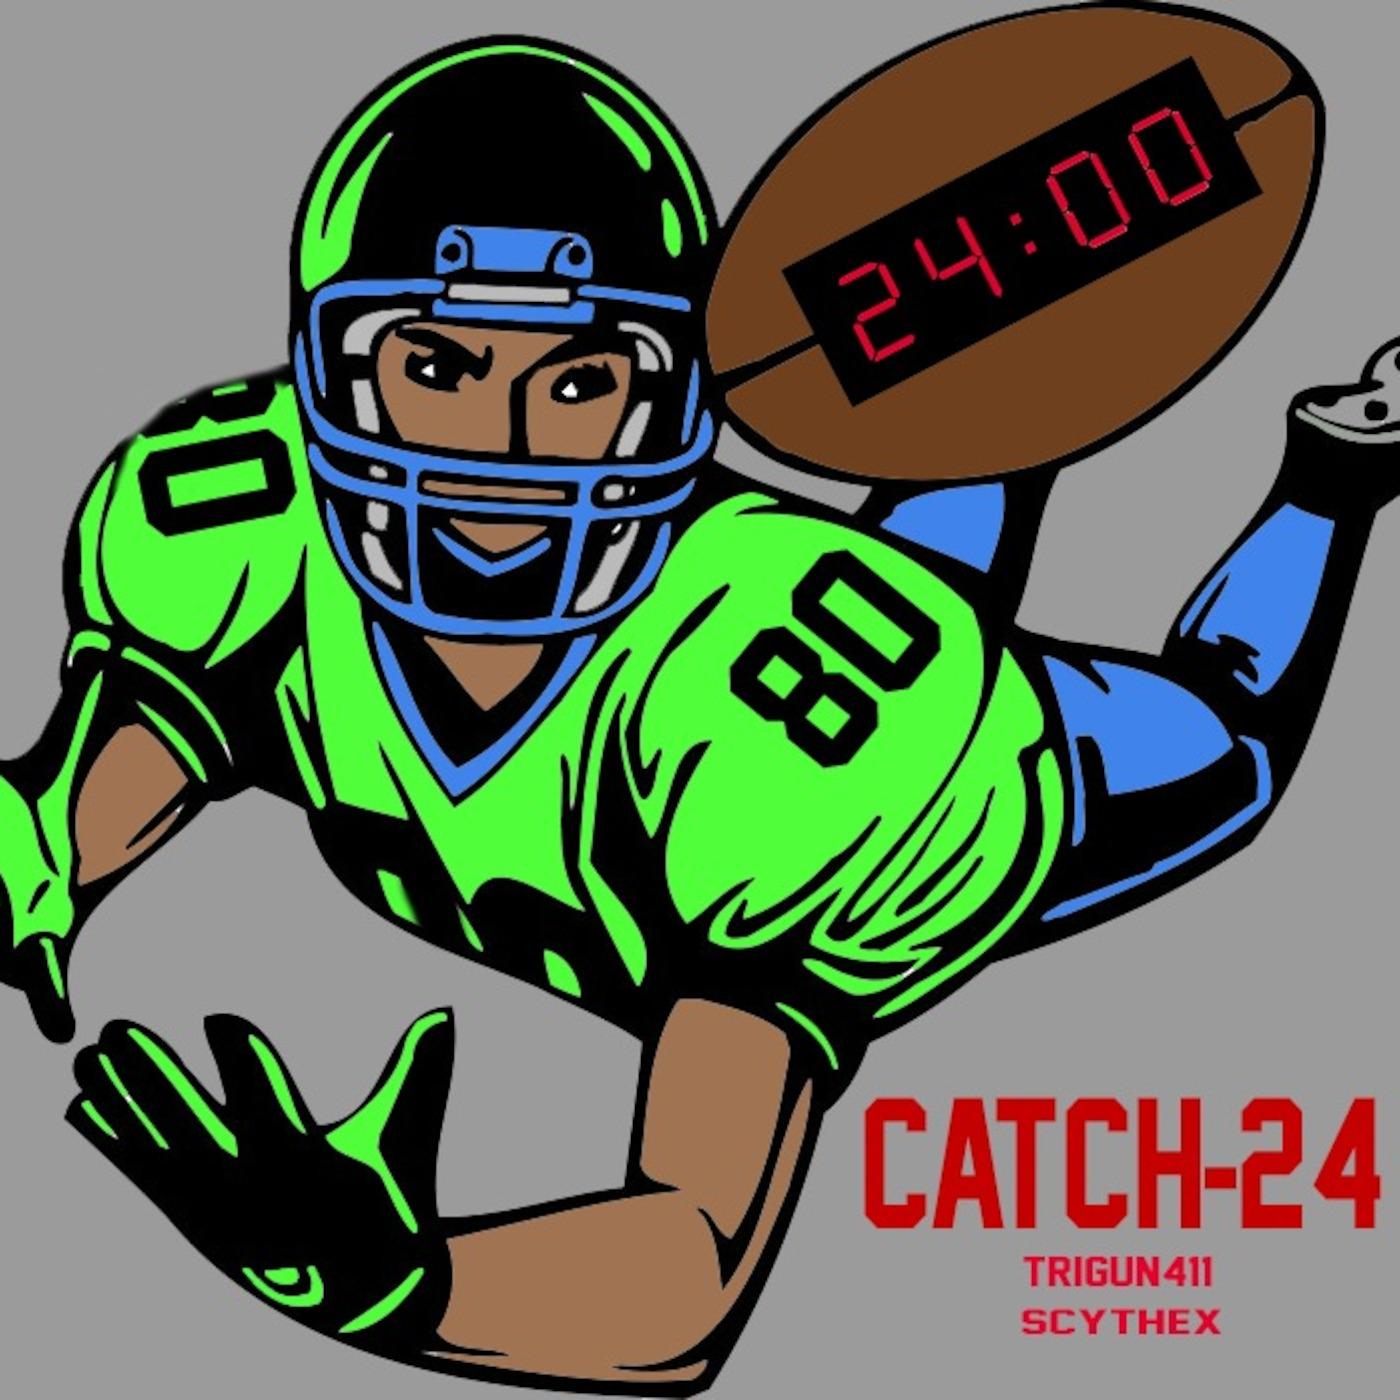 Catch-24 Episode 1 (Pilot)